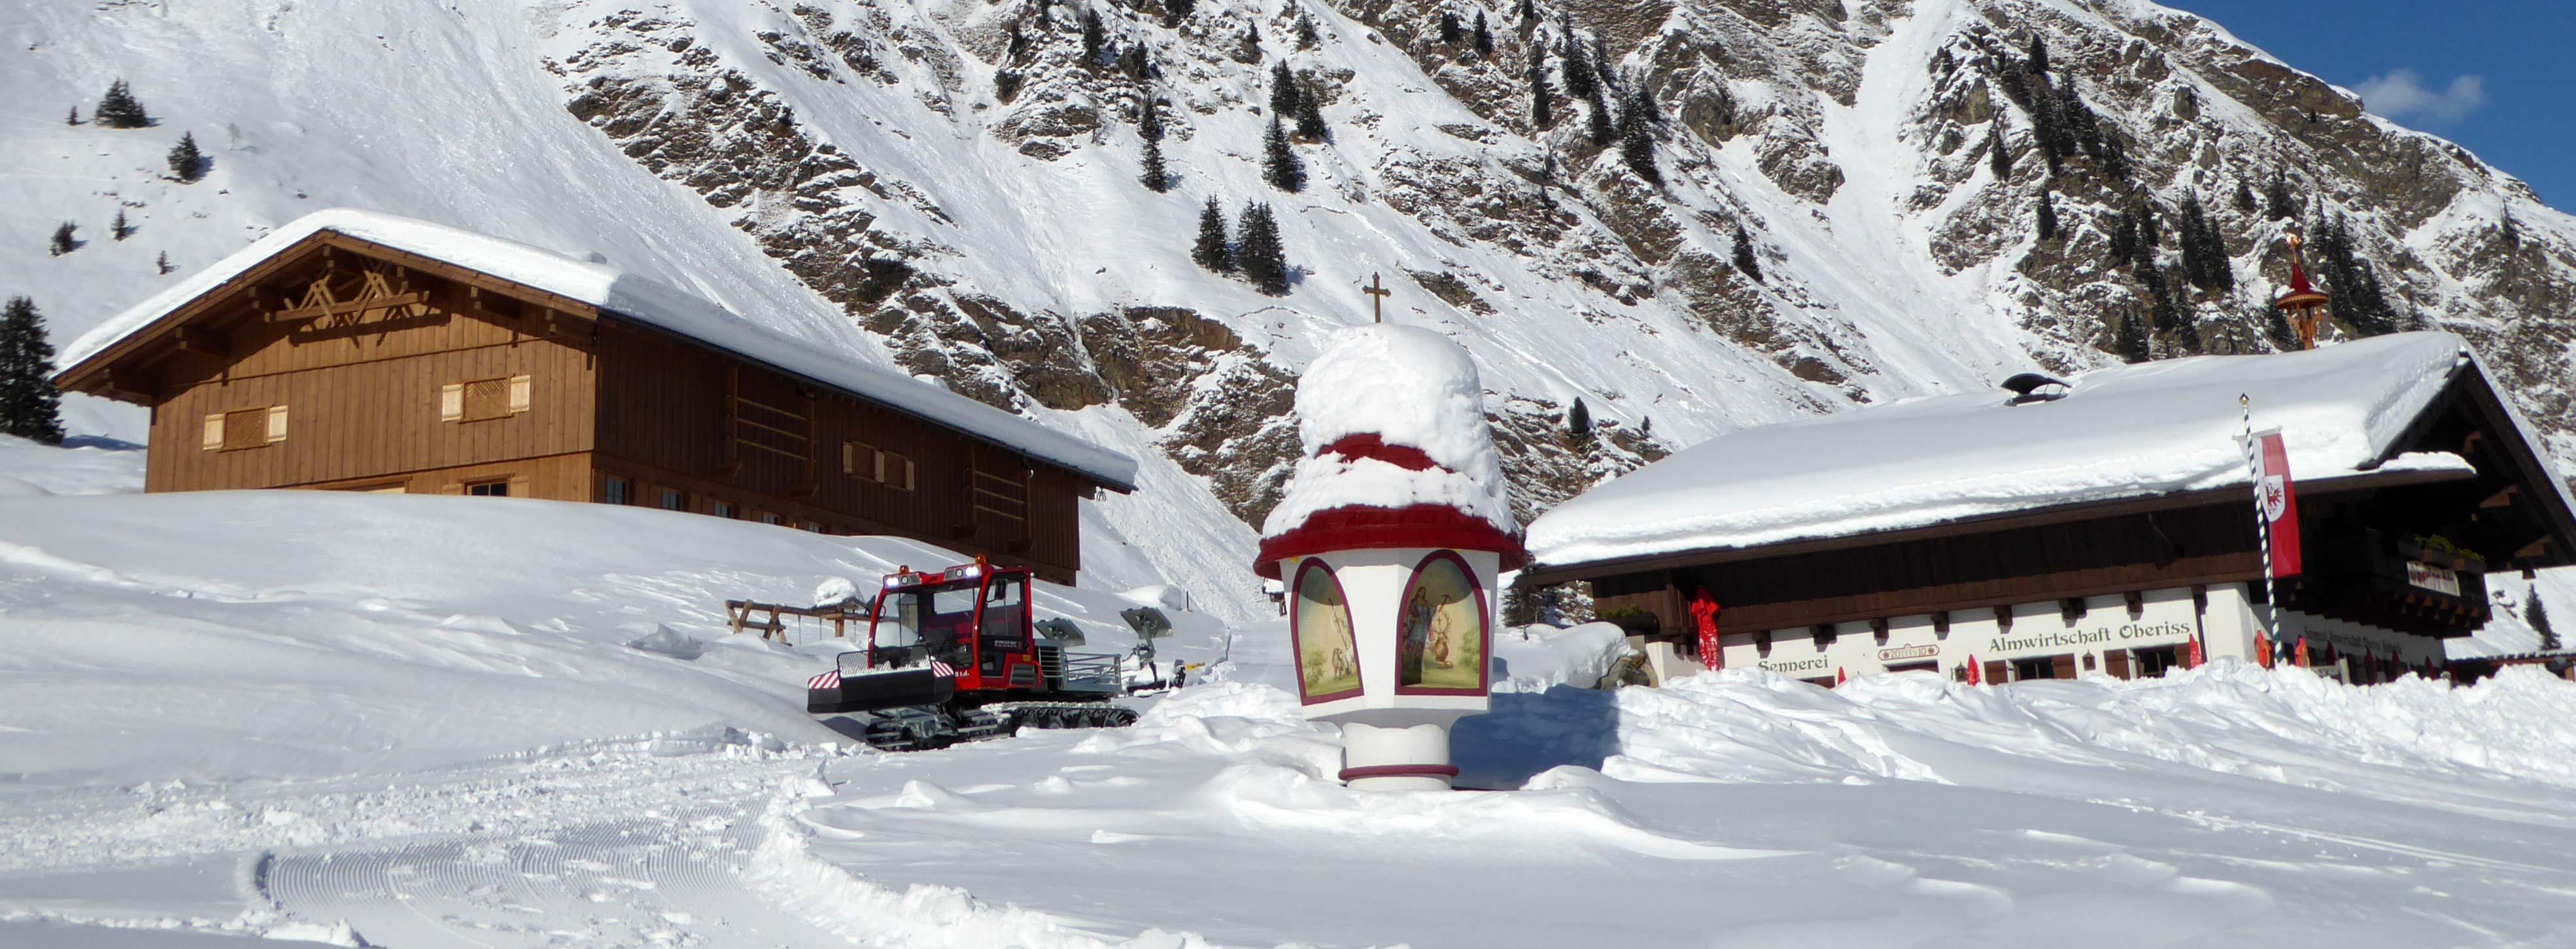 Oberiss Alm Stubaital Neustift Tirol Ausflugsziel im Winter